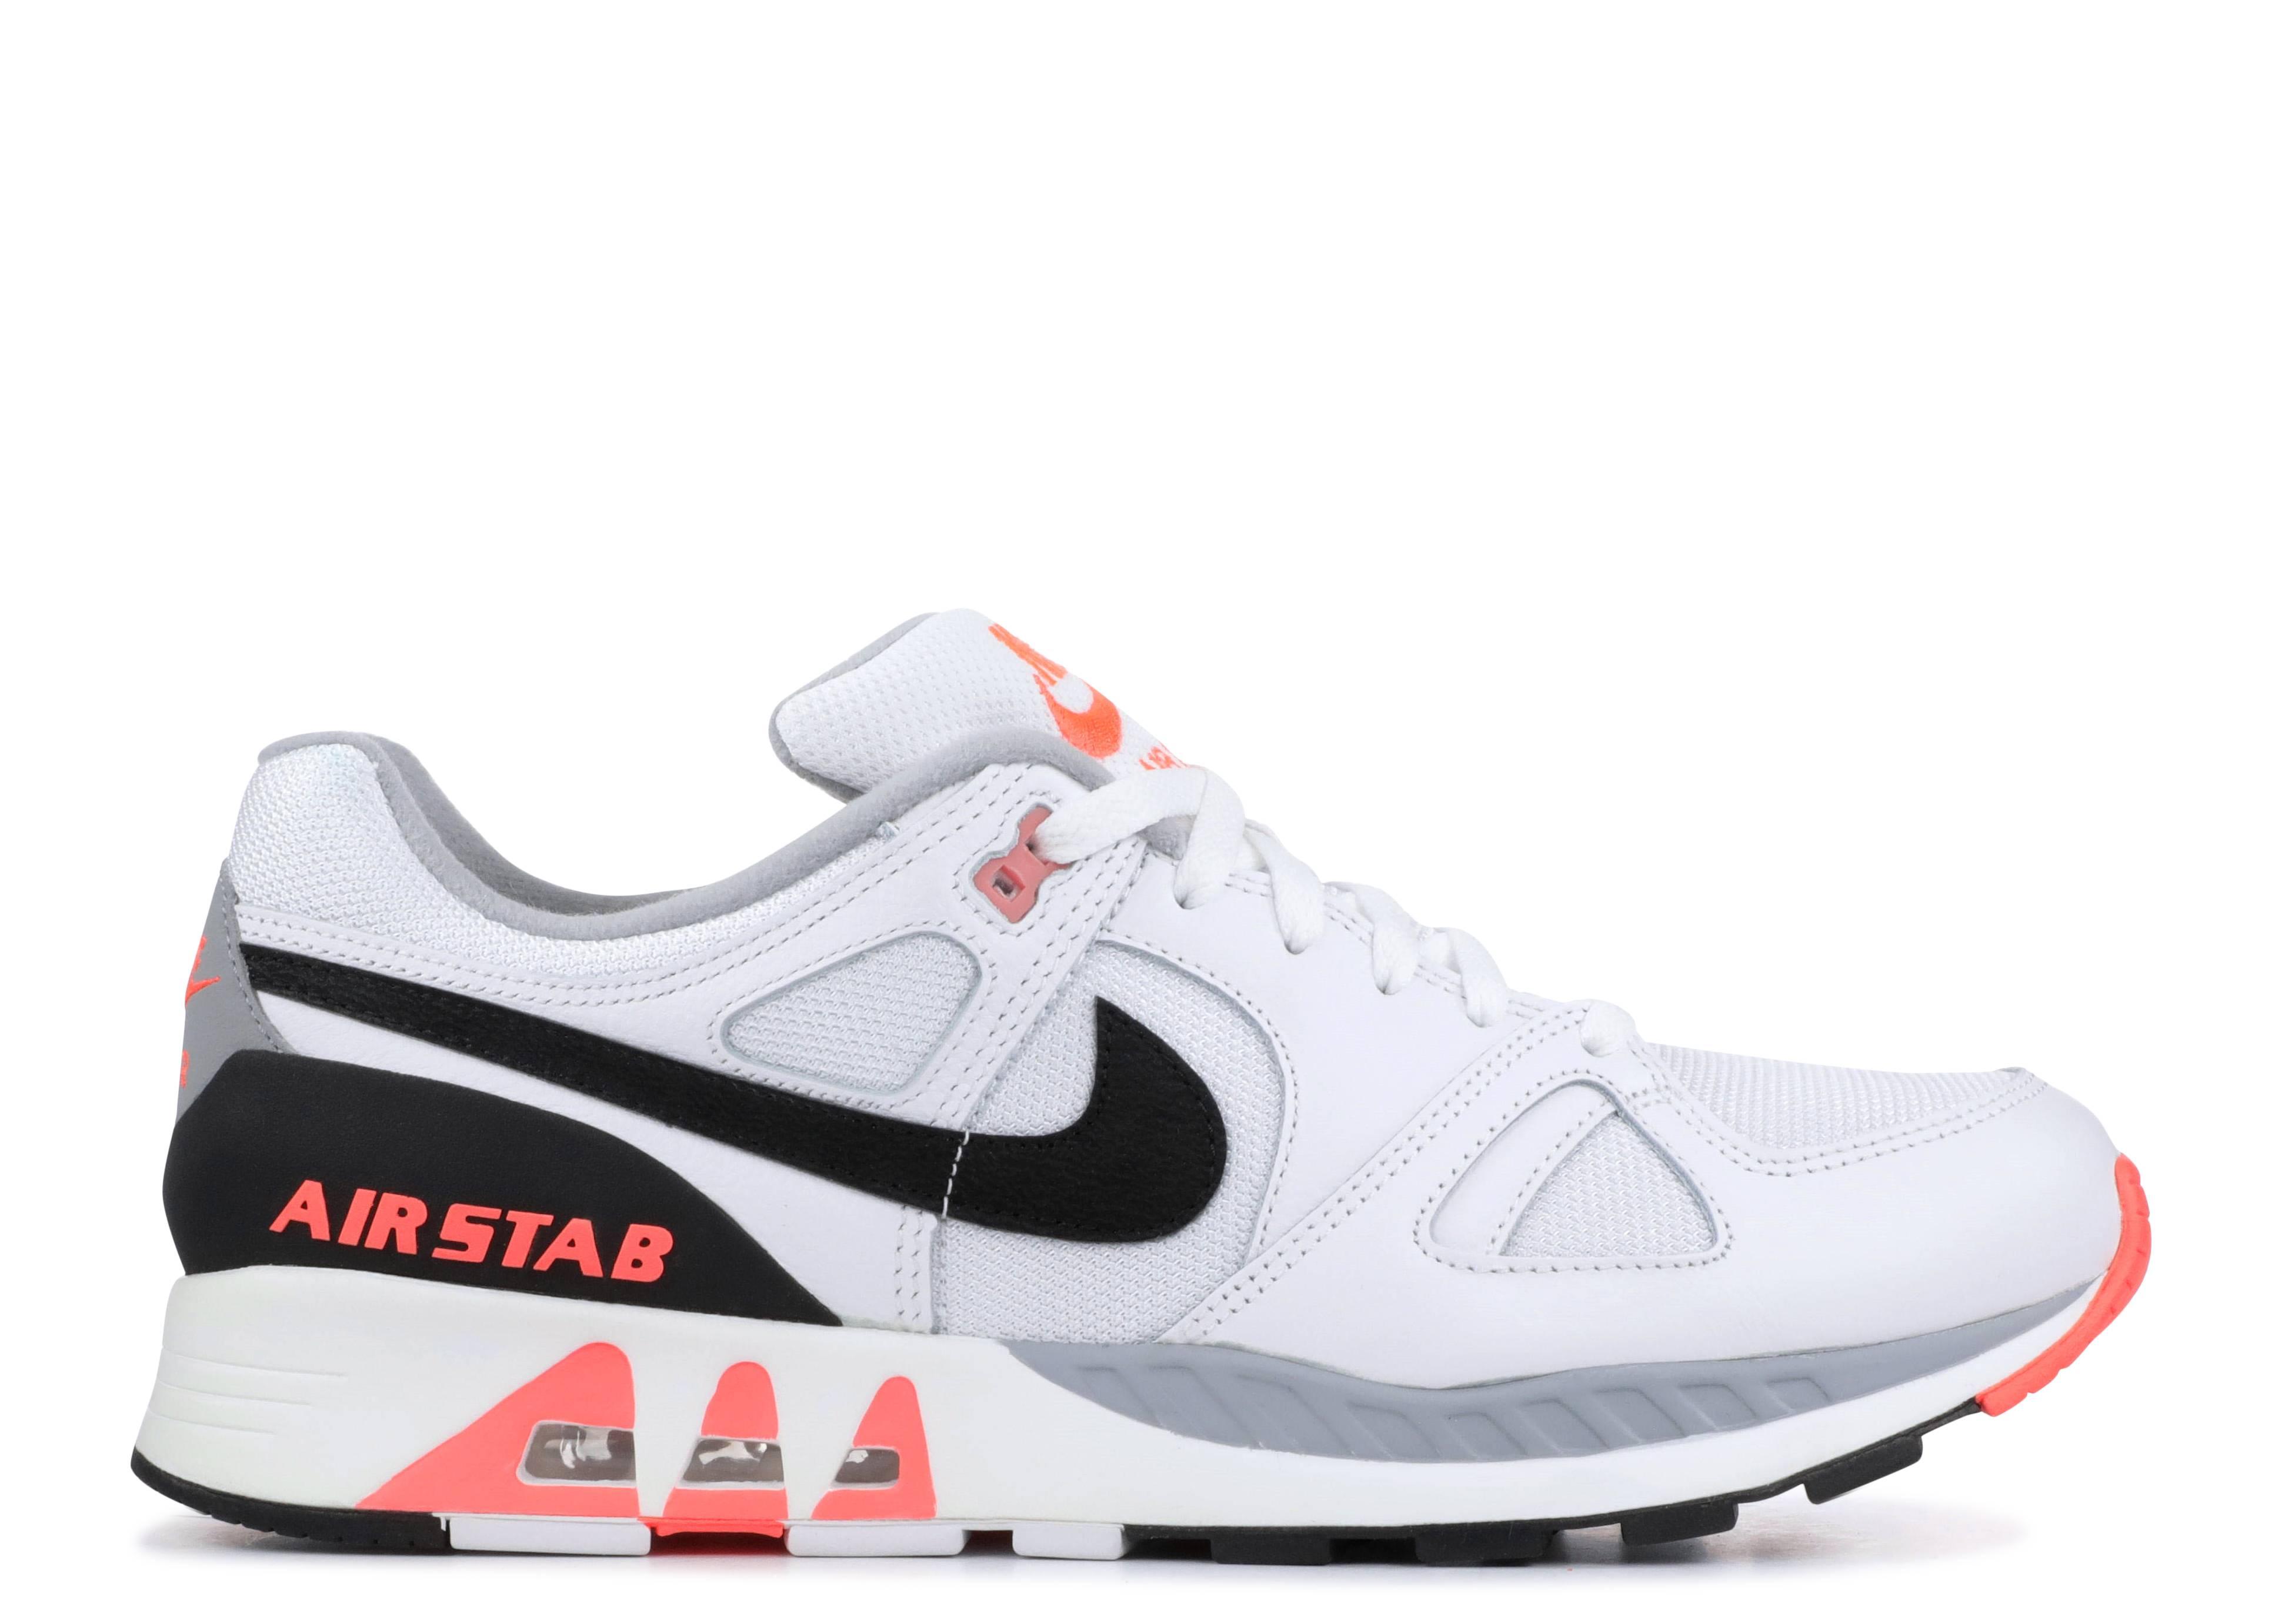 on sale 2dace 03455 Nike Air Stab - Nike - 312451 101 - white  black hot lava   Flight Club